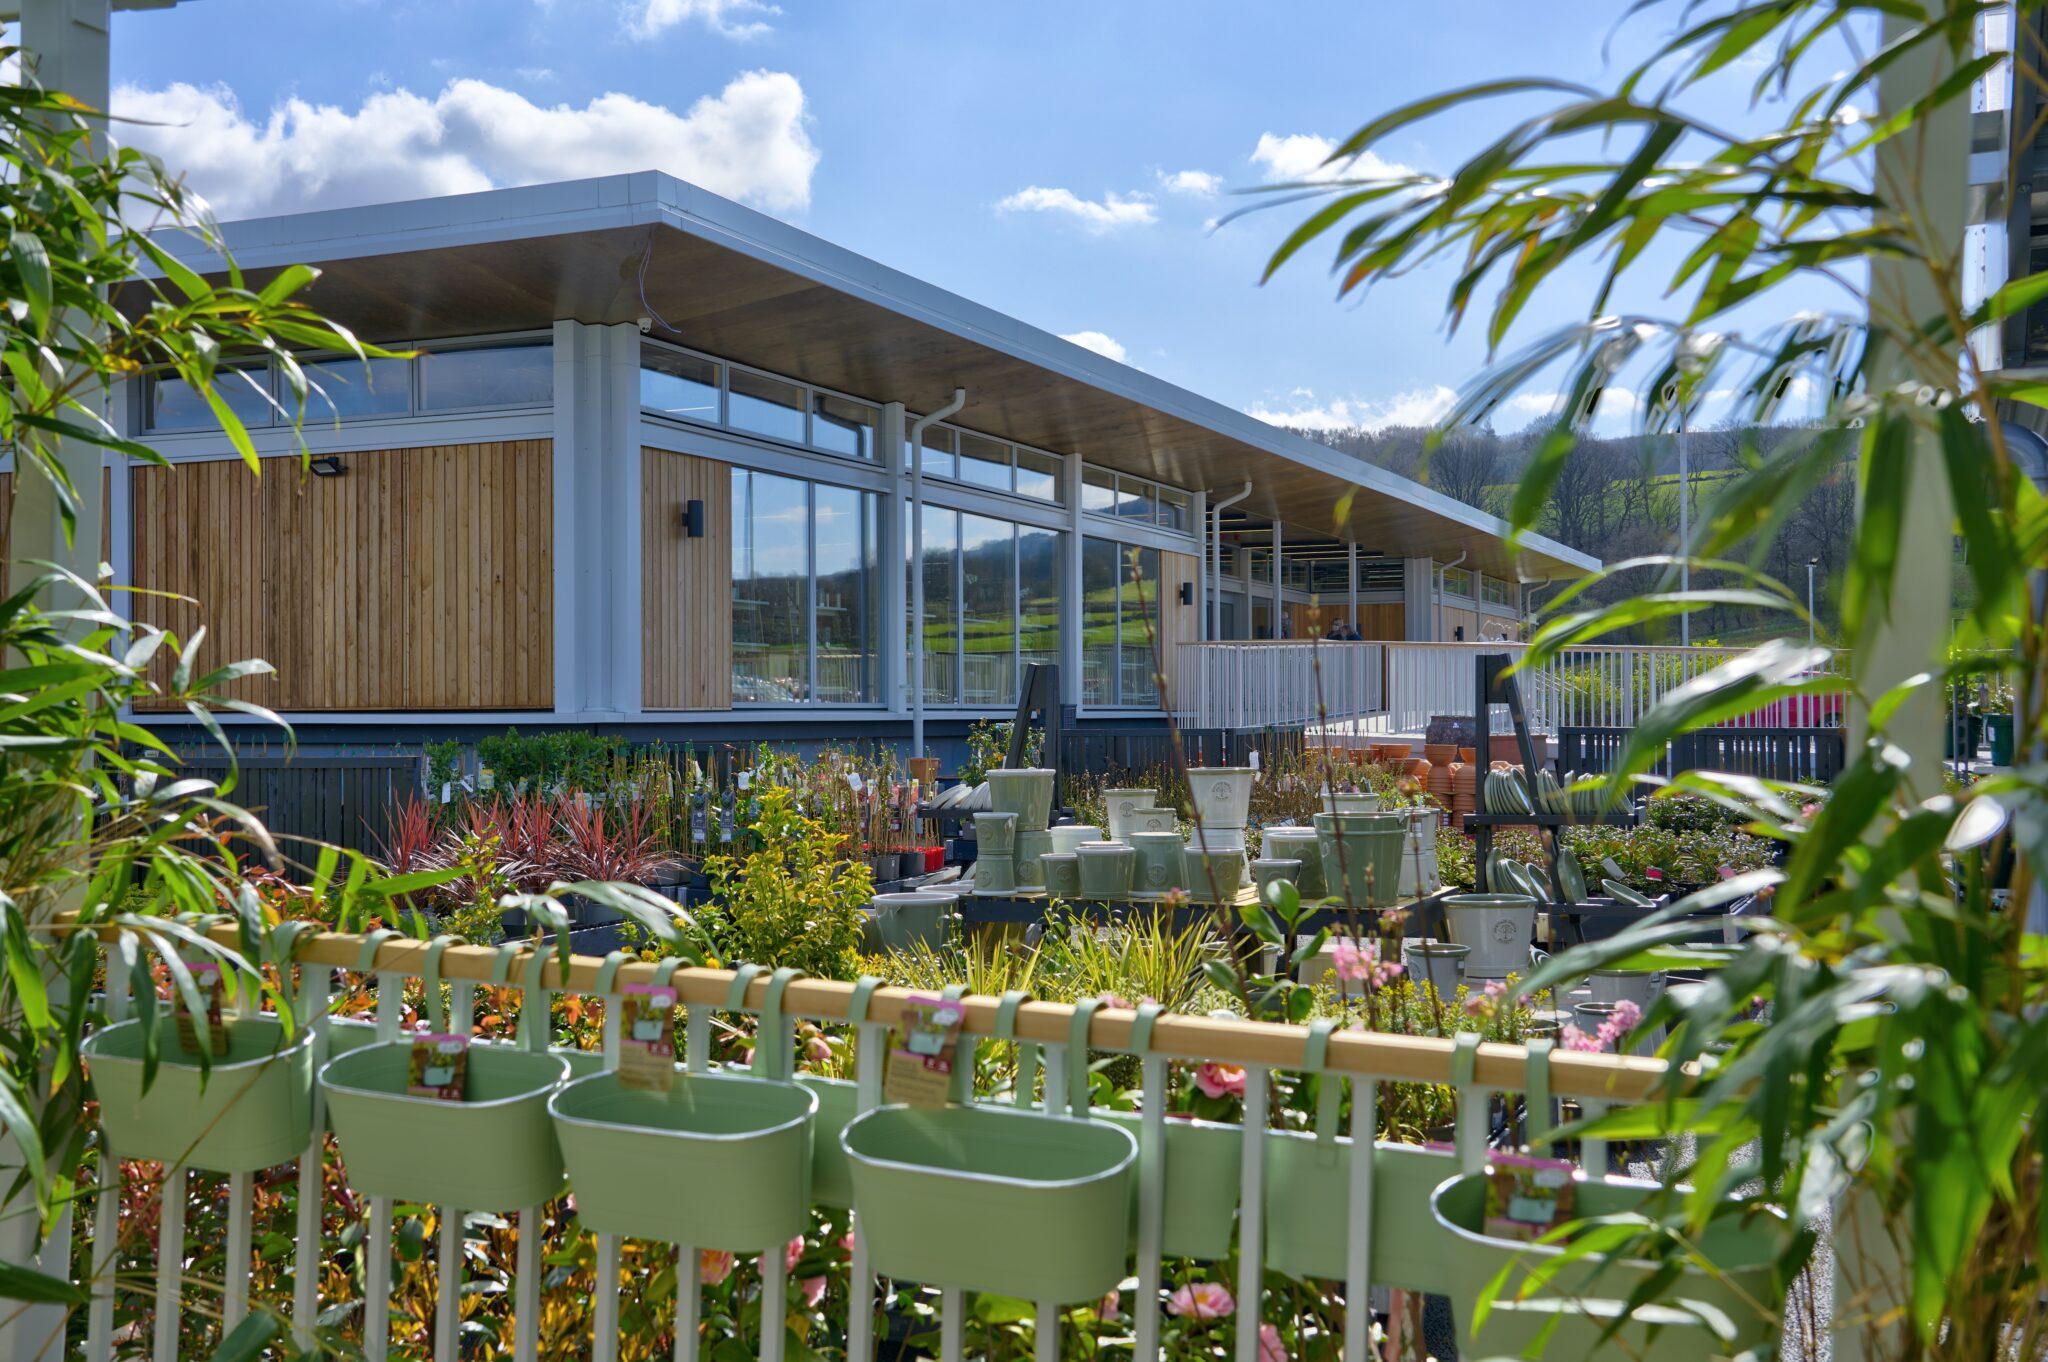 Moss & Moor garden centre